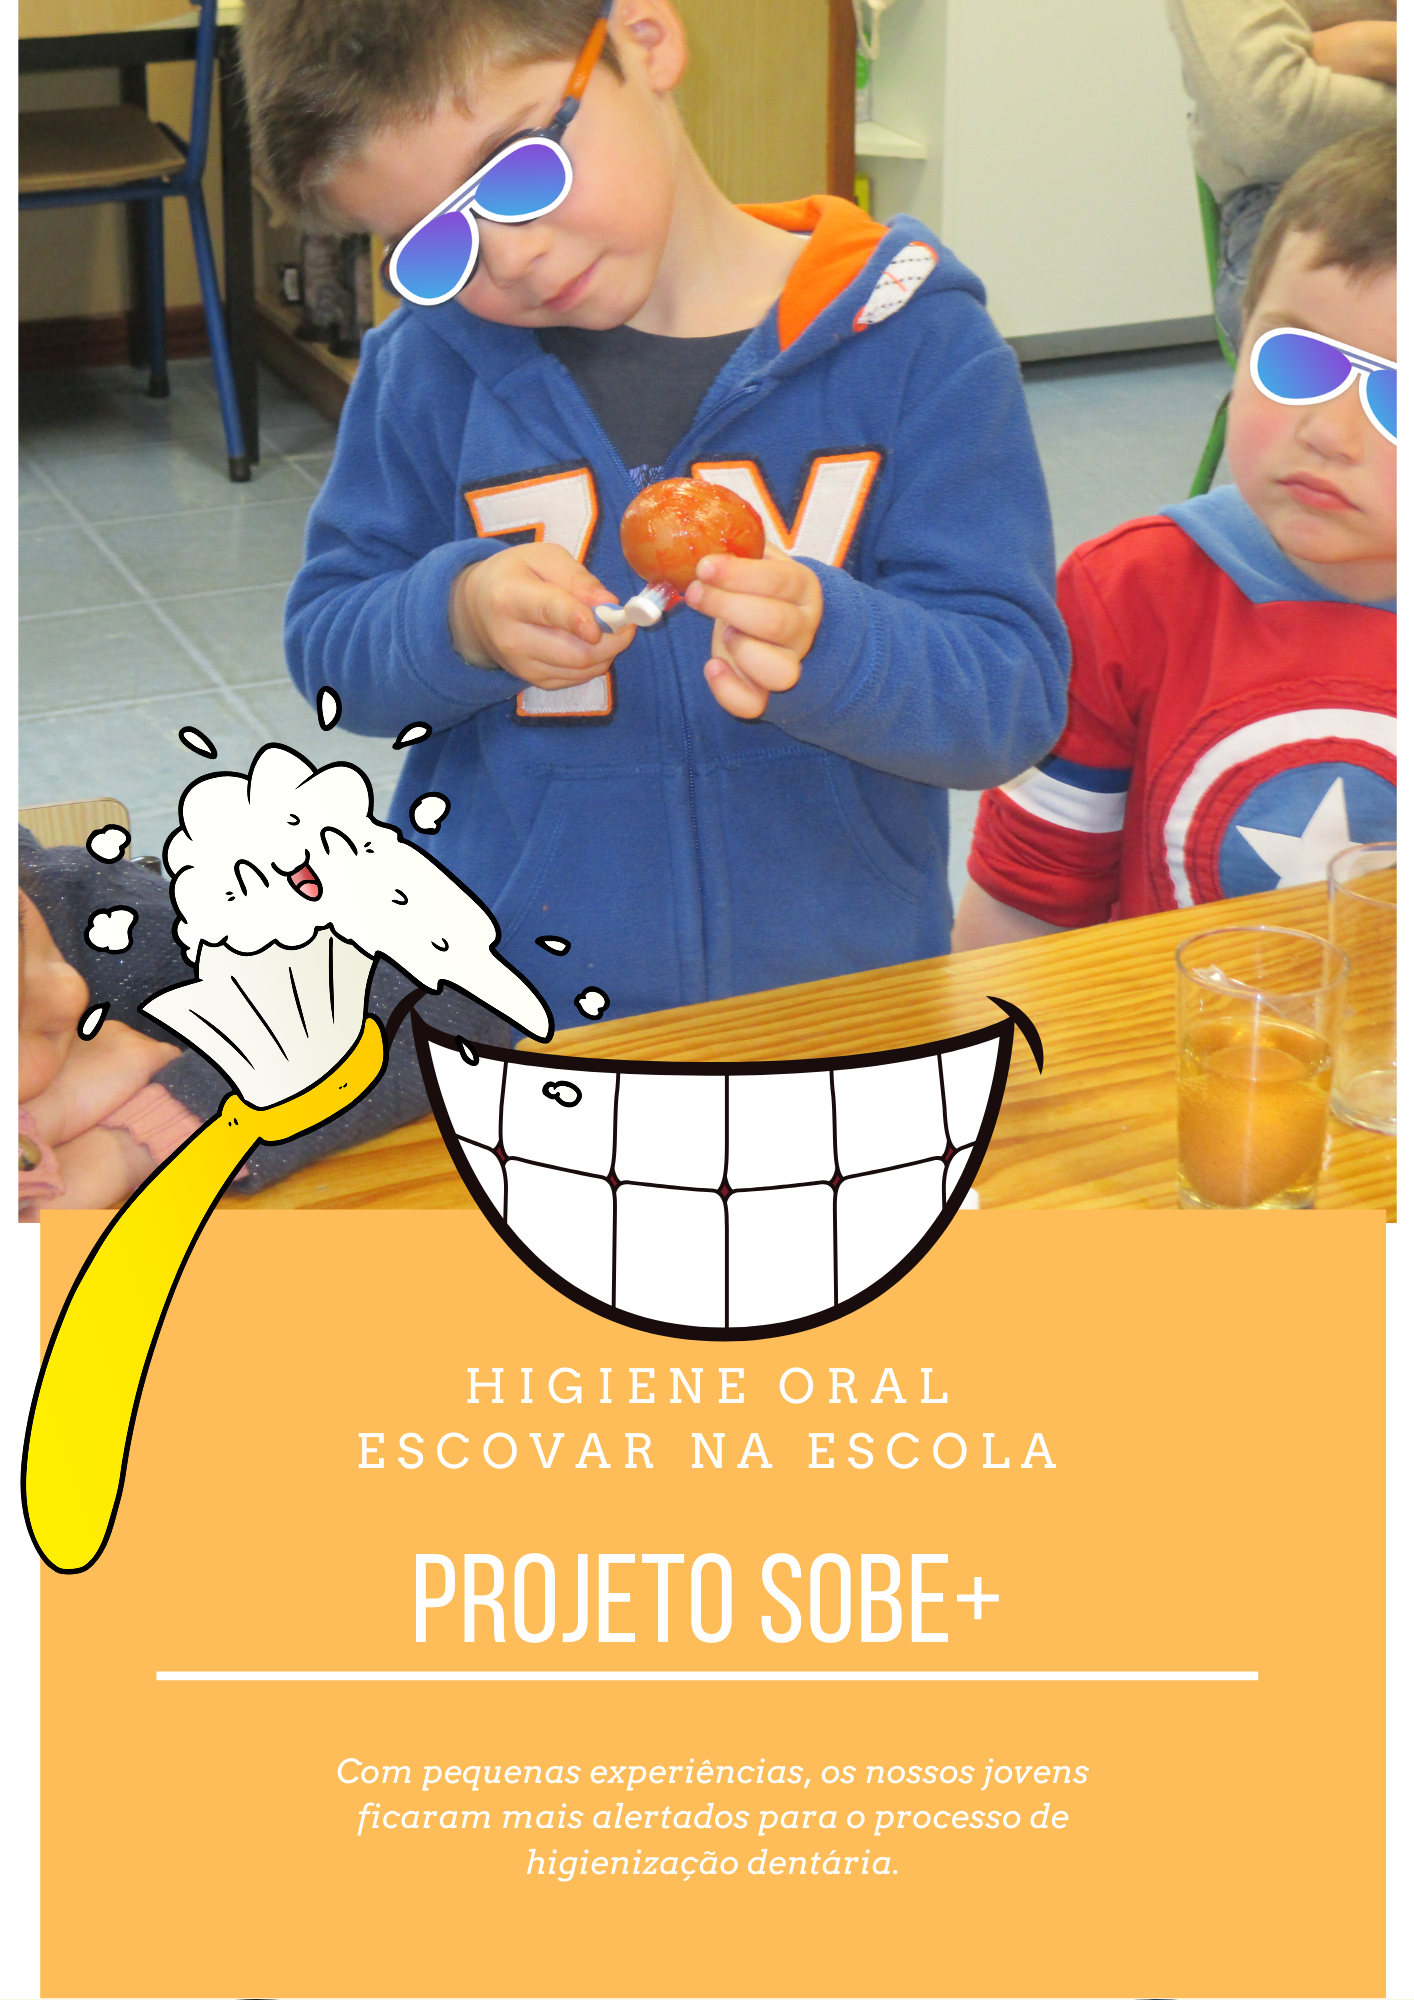 .: Projeto SOBE+ : Escovar na Escola :.